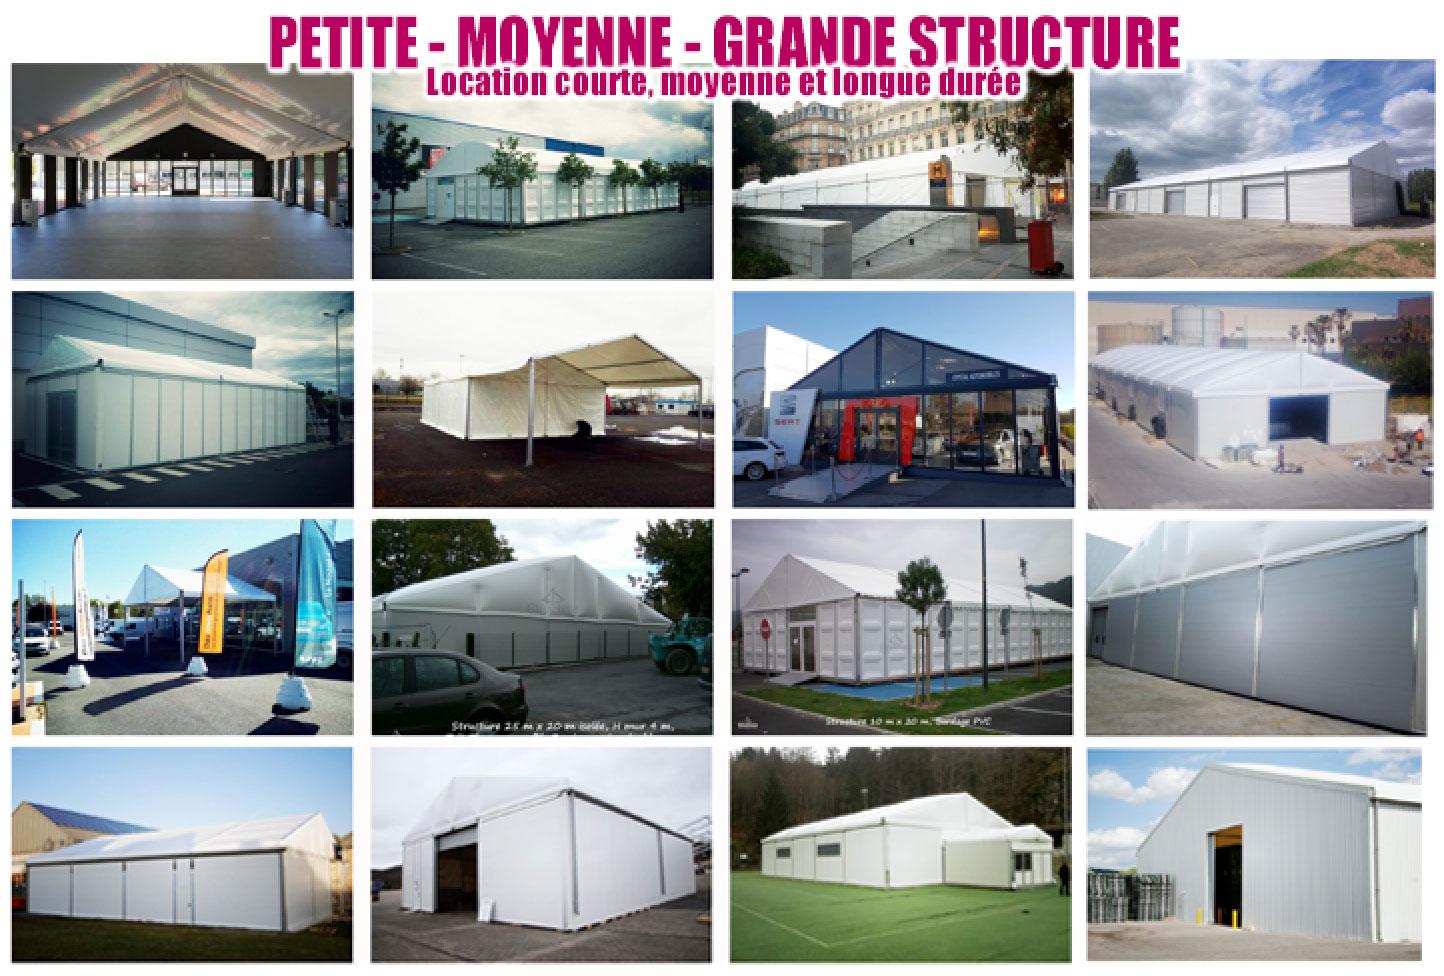 bâtiment industriel petite moyenne grande structure Structura location vente